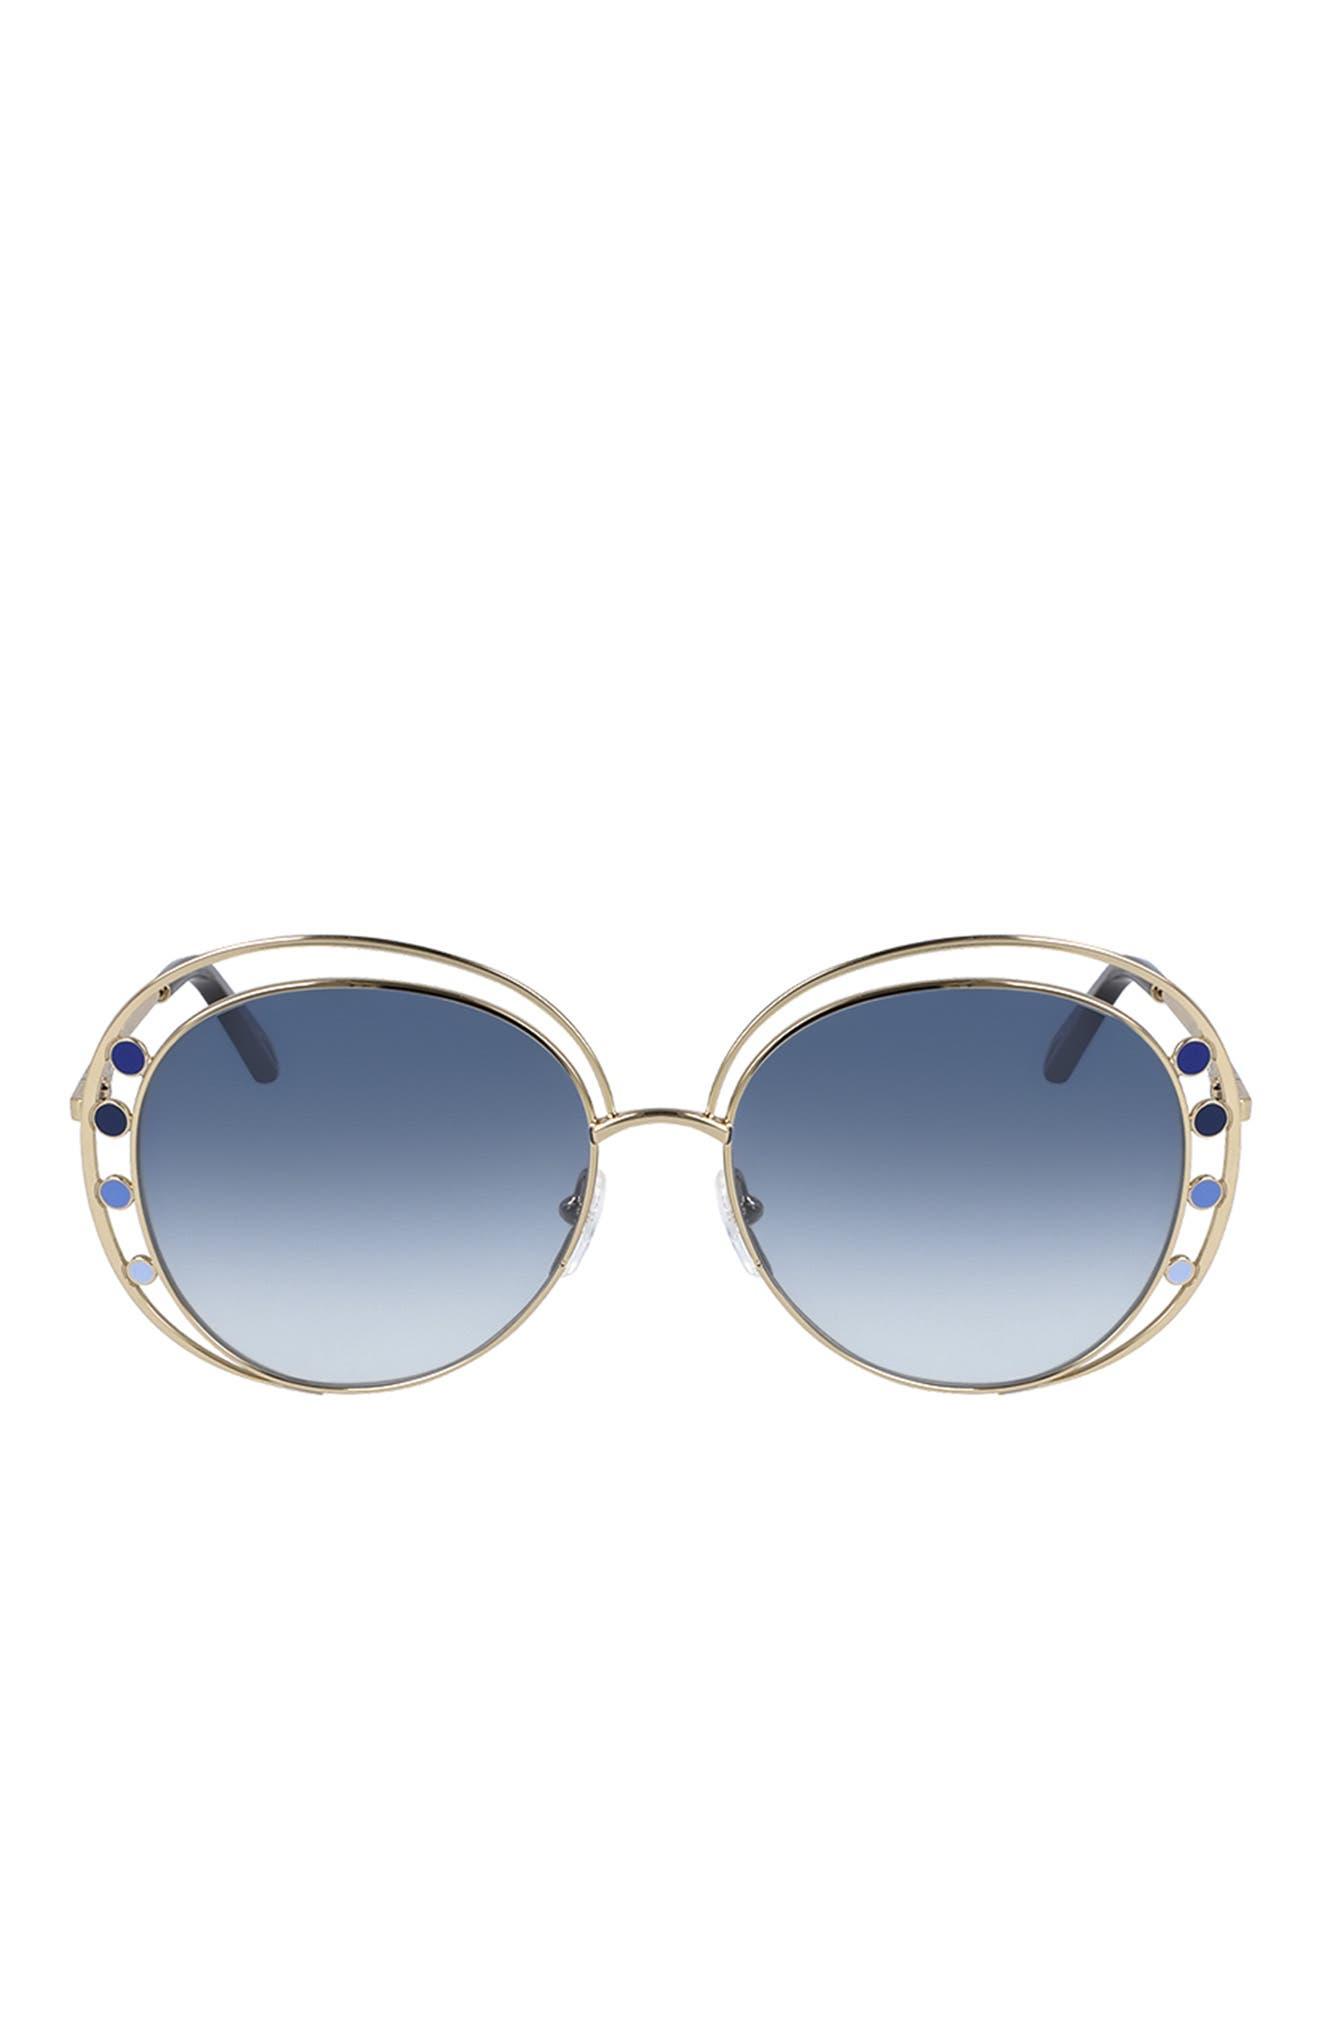 Image of Chloe Round 57mm Sunglasses